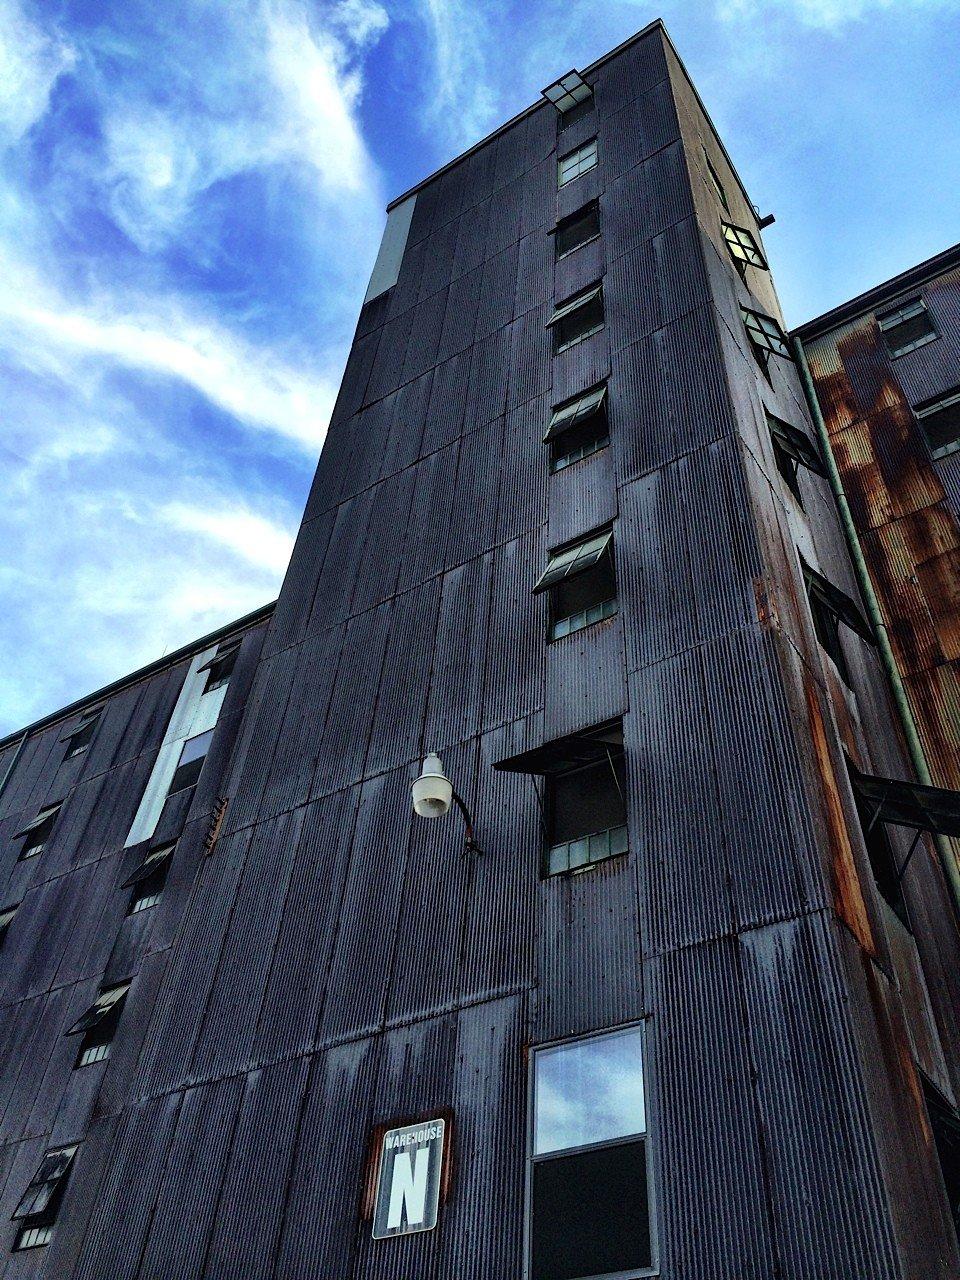 Food + Drink sky building outdoor skyscraper blue tower block urban area landmark metropolis Architecture City facade Downtown cityscape reflection tower